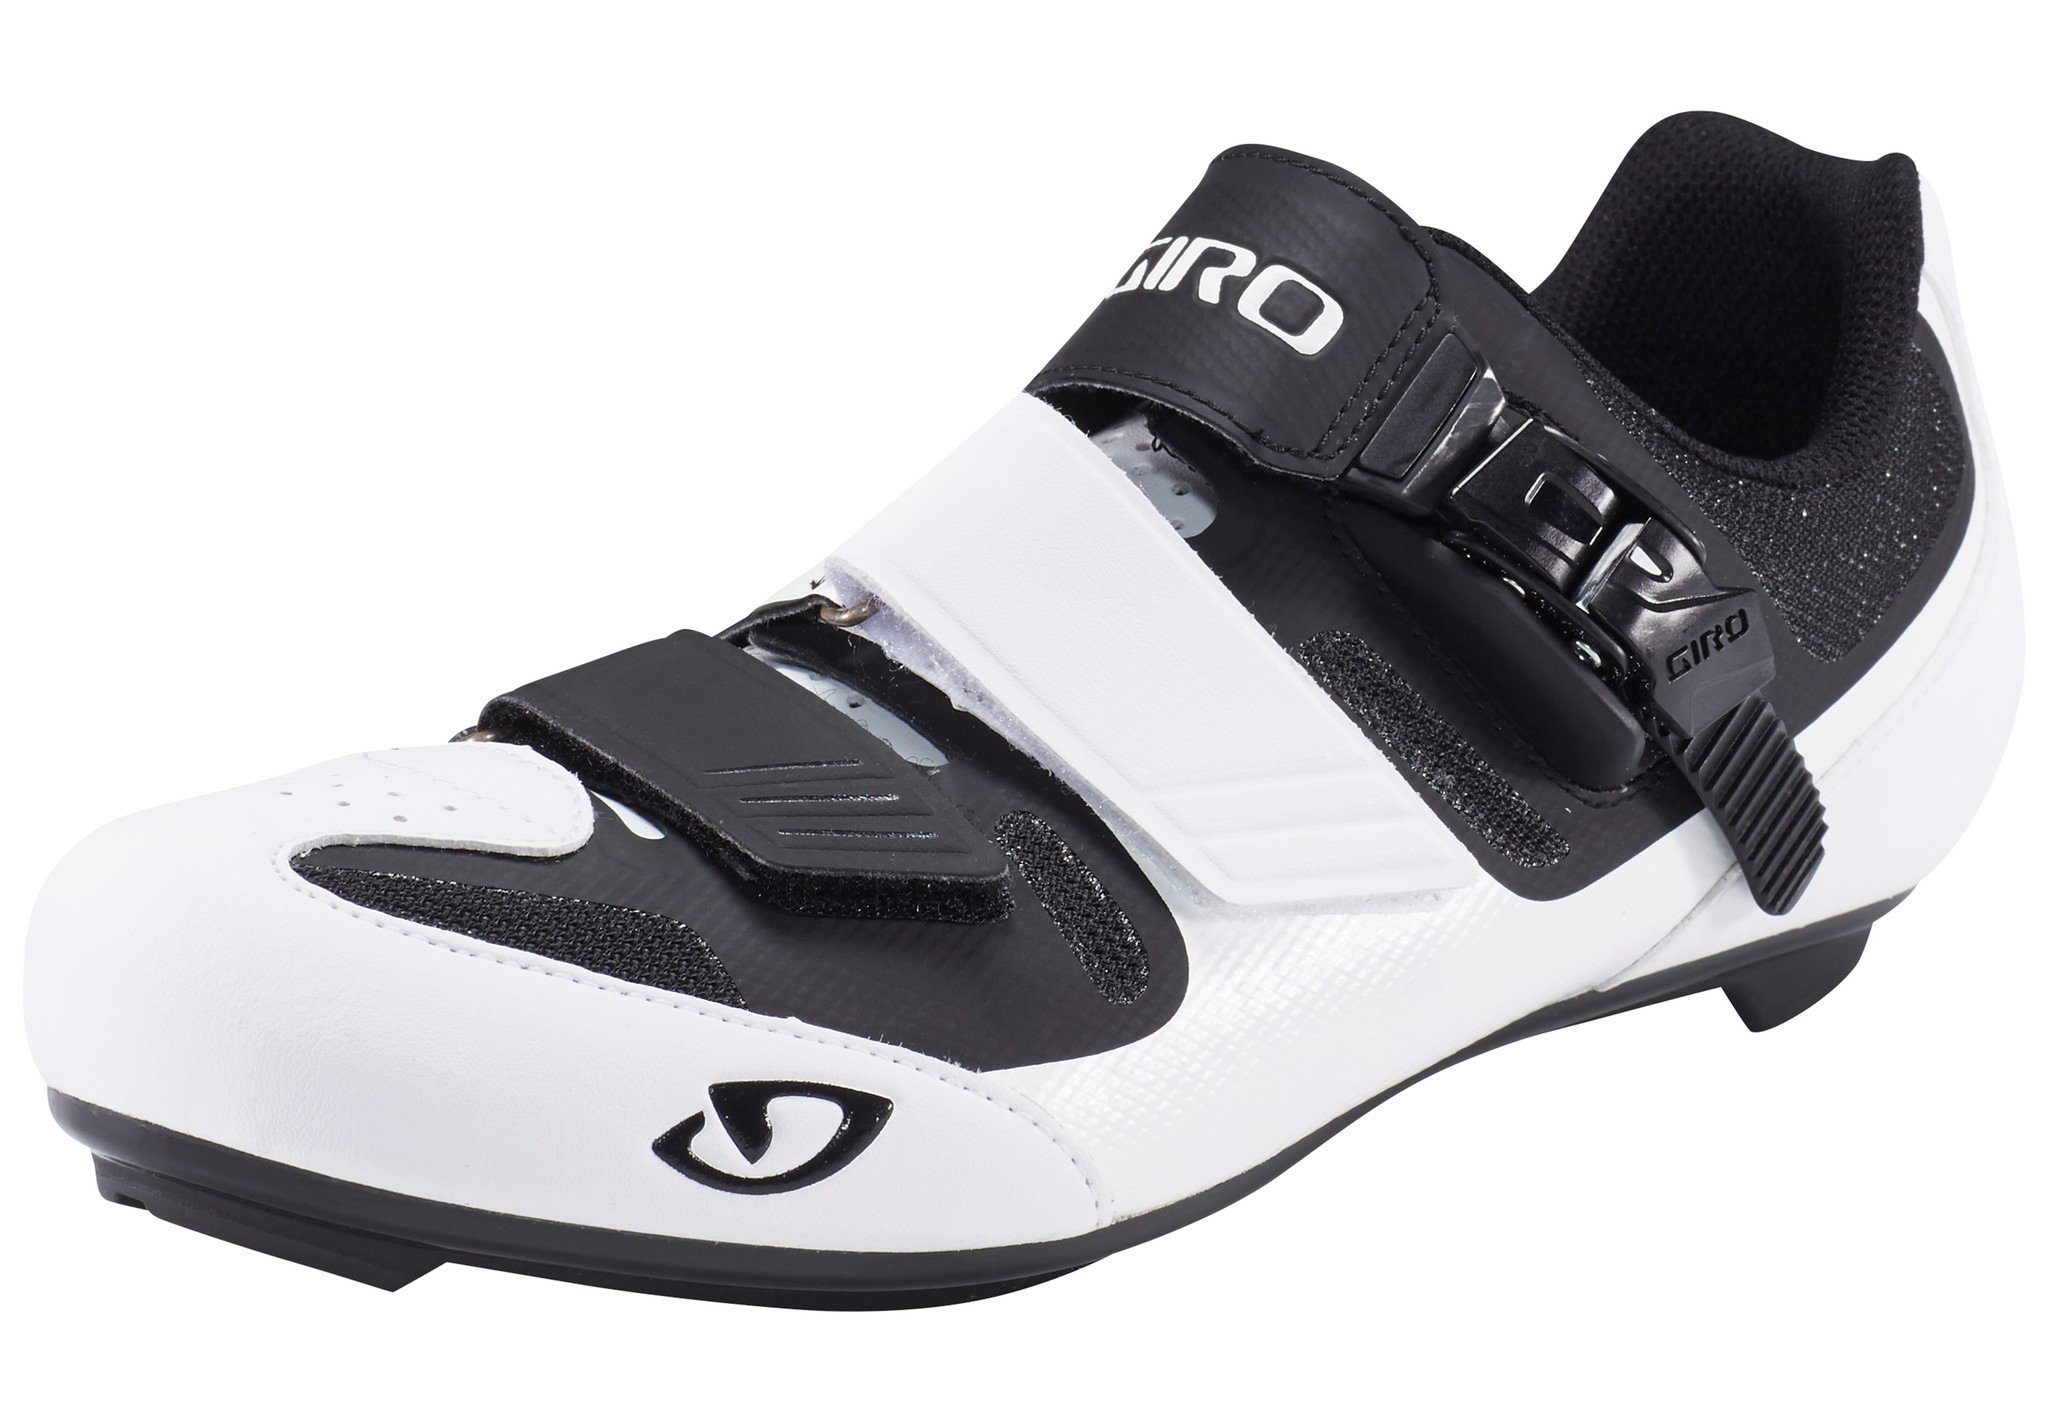 Giro Fahrradschuhe Apeckx II Shoes Men kaufen  weiß